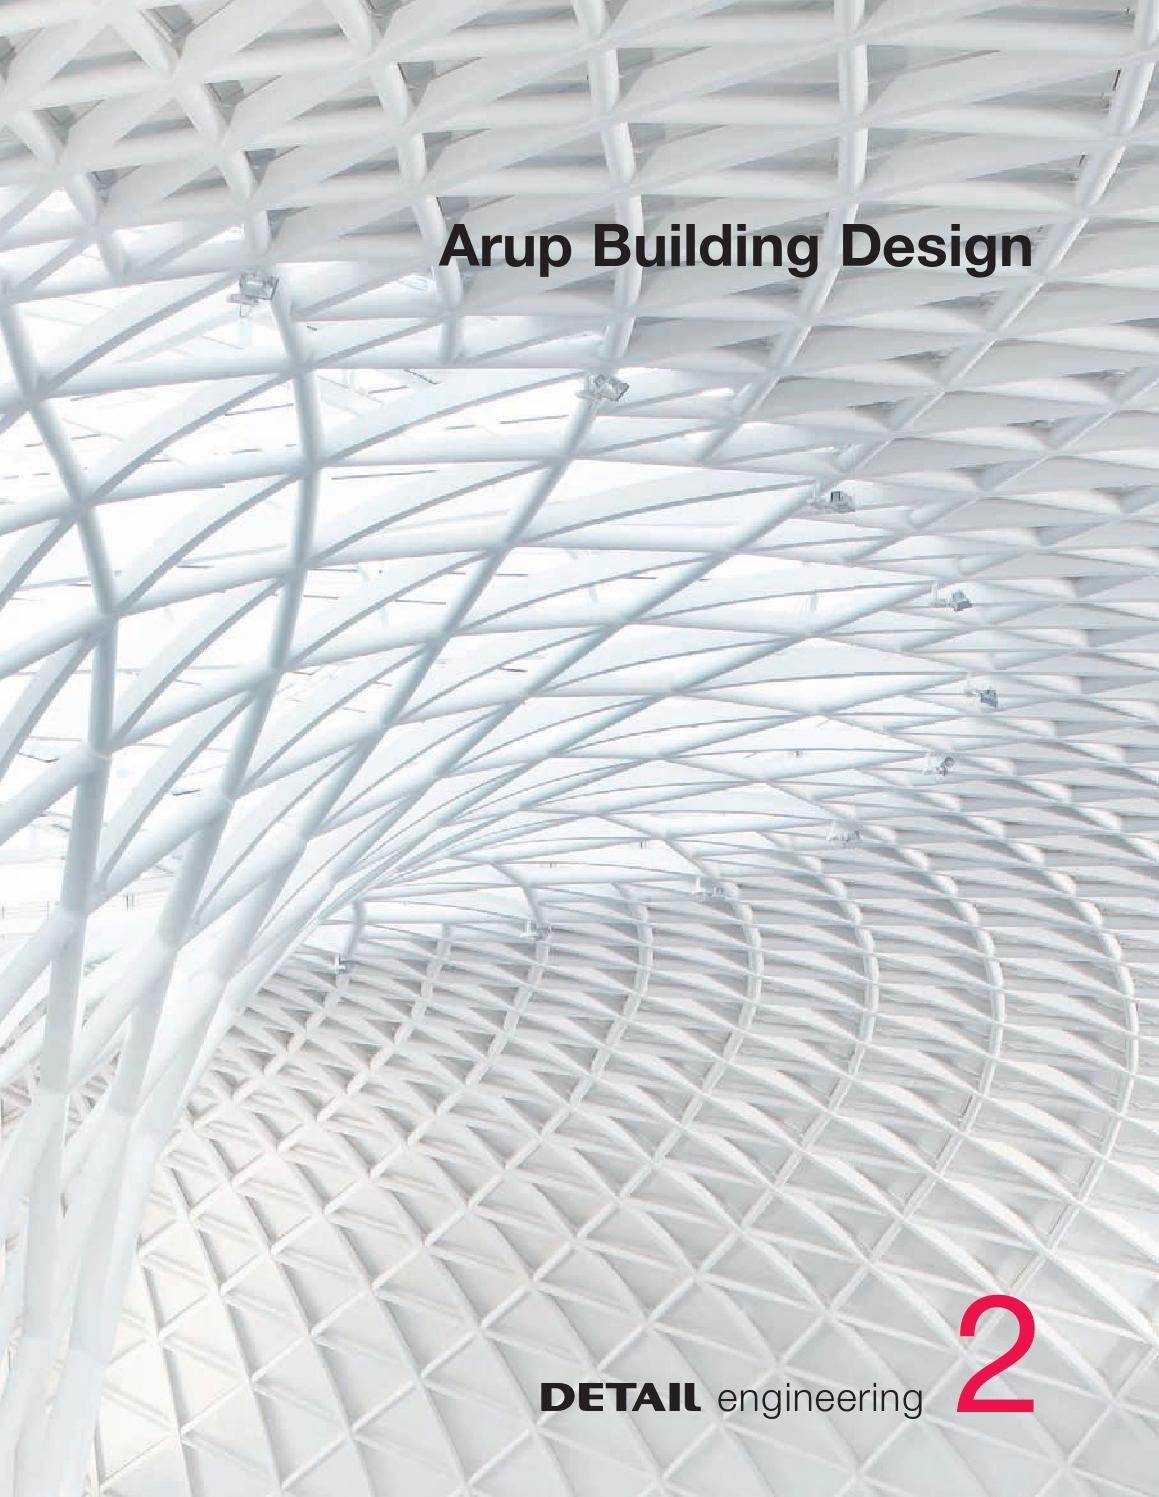 DETAIL engineering 2: Arup Building Design by DETAIL - issuu